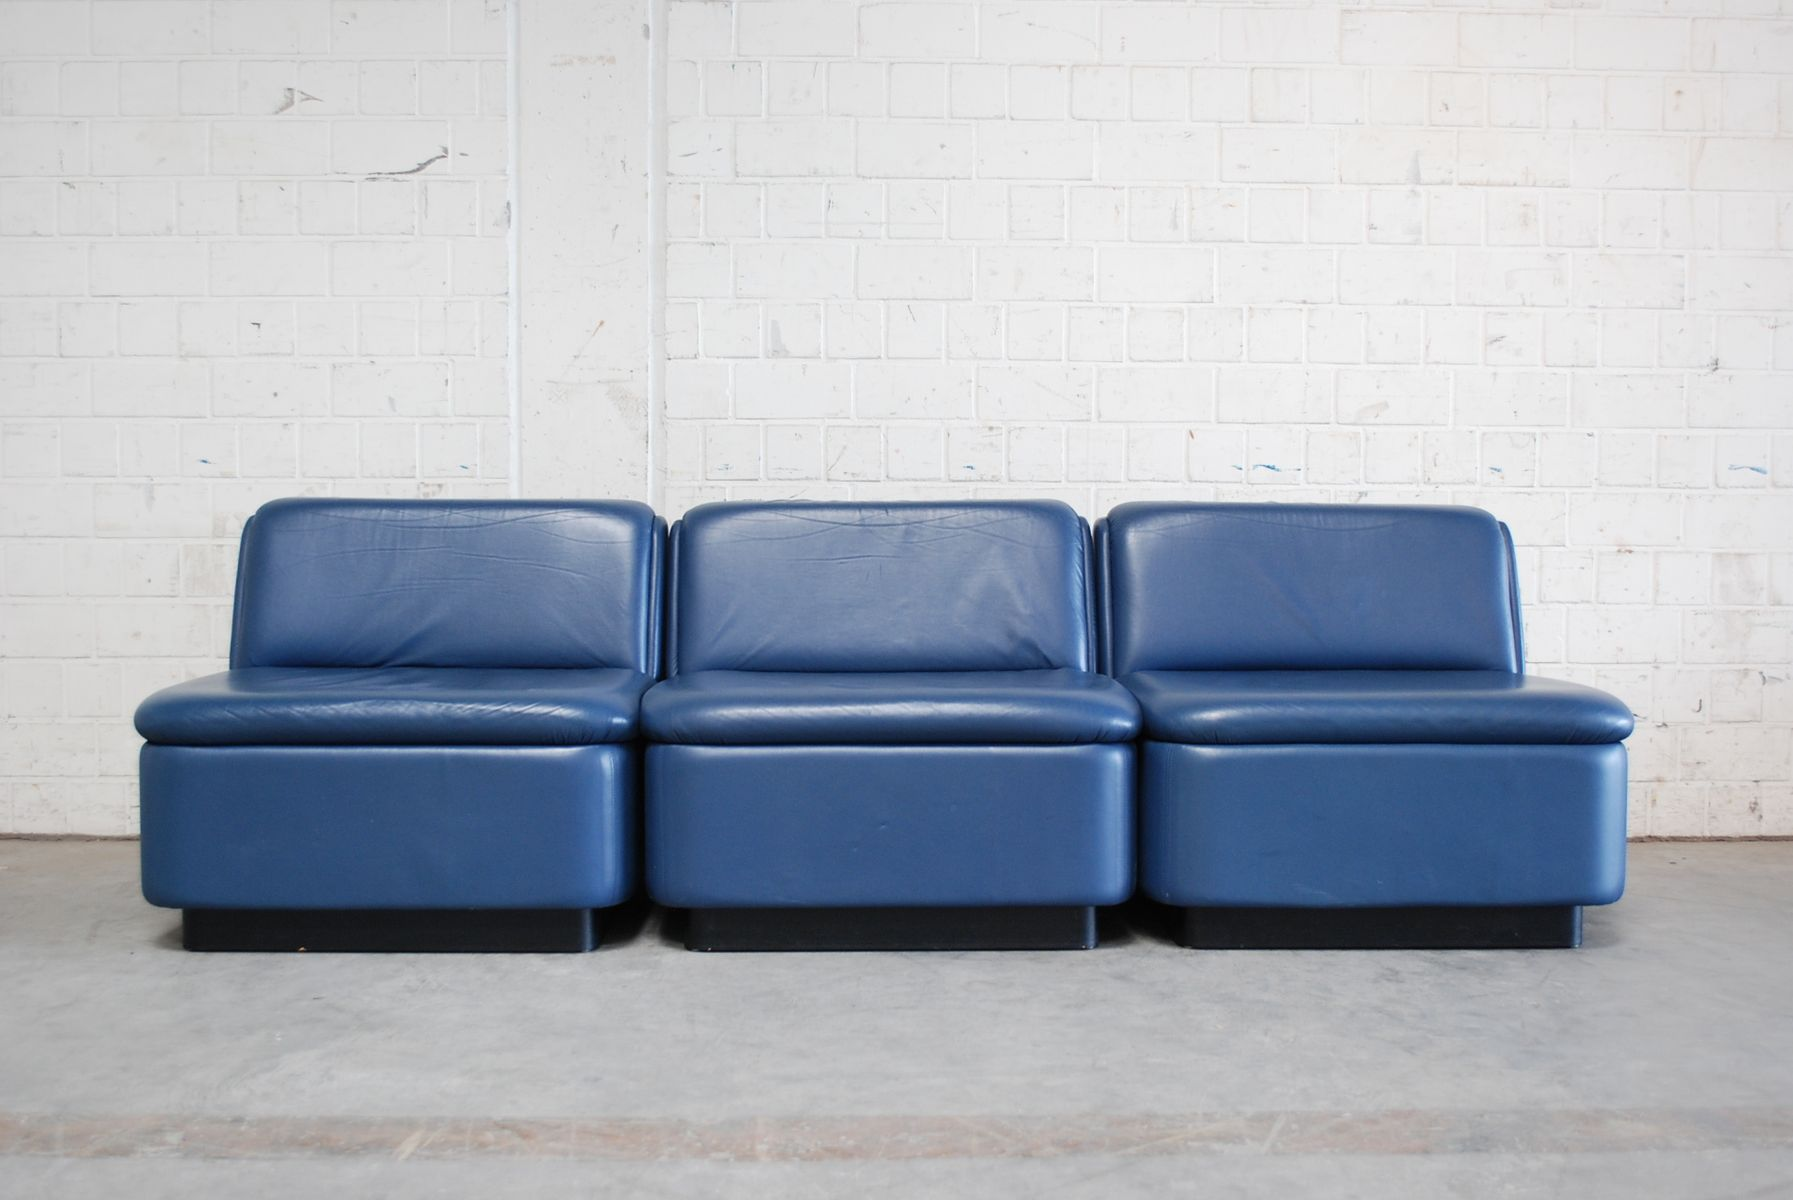 blaues modulares vintage ledersofa 1979 bei pamono kaufen. Black Bedroom Furniture Sets. Home Design Ideas